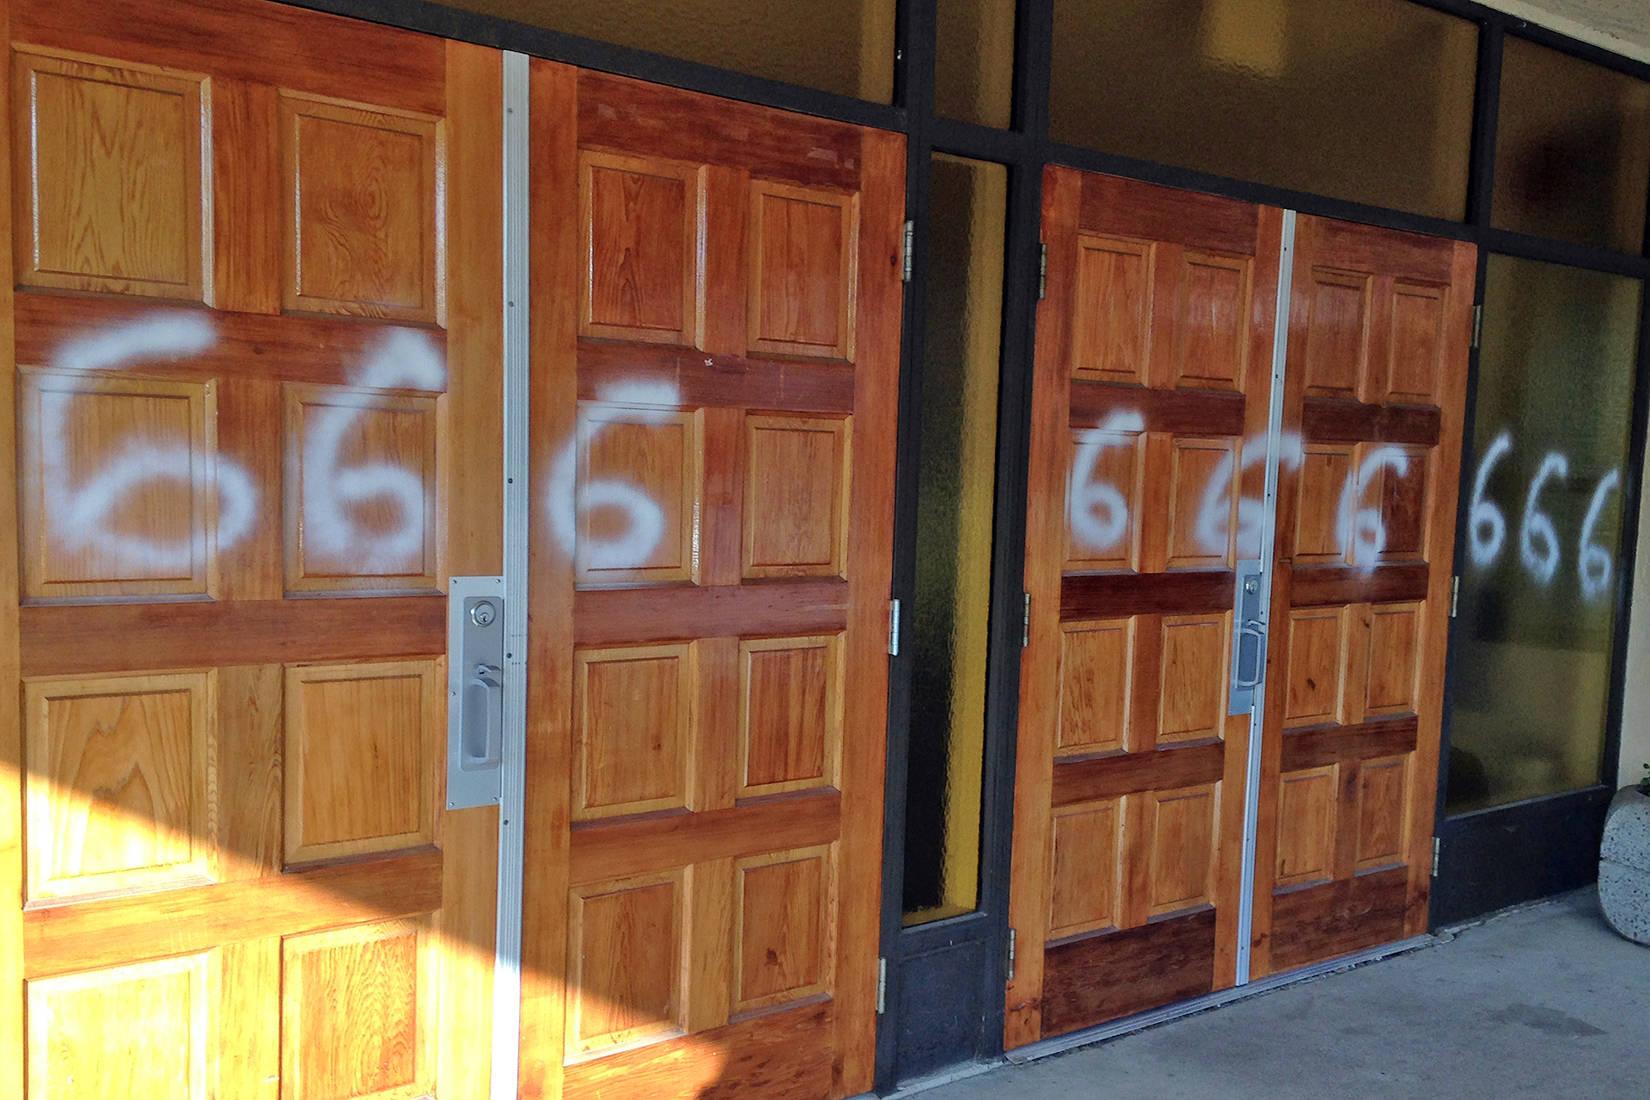 Community 'rattled' after 666 scrawled all over B.C. Catholic church